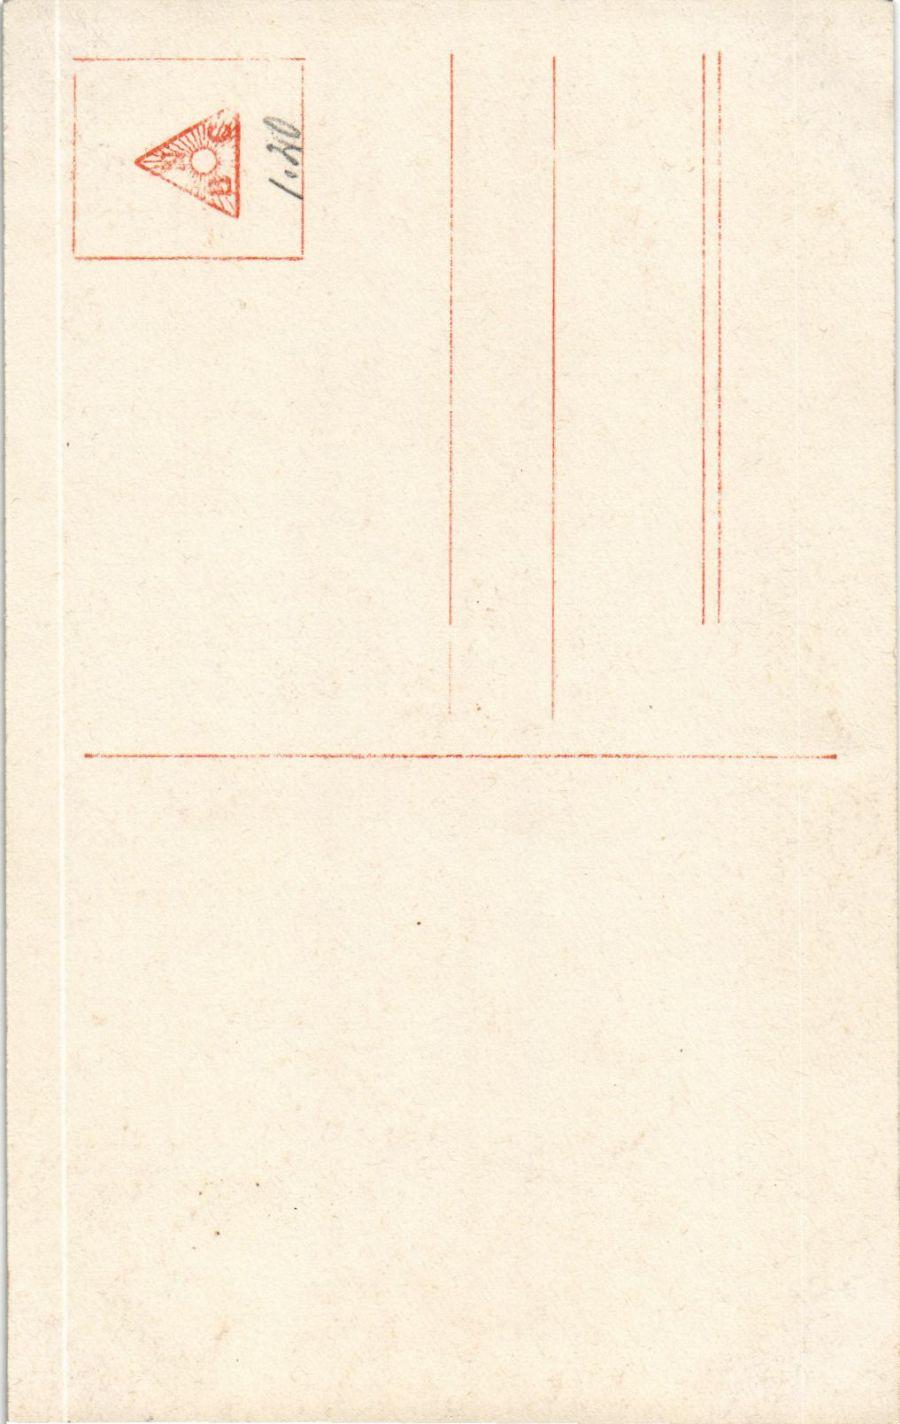 CPA-AK-Prinz-Wilhelm-v-Preussen-GERMAN-ROYALTY-867558 Indexbild 2